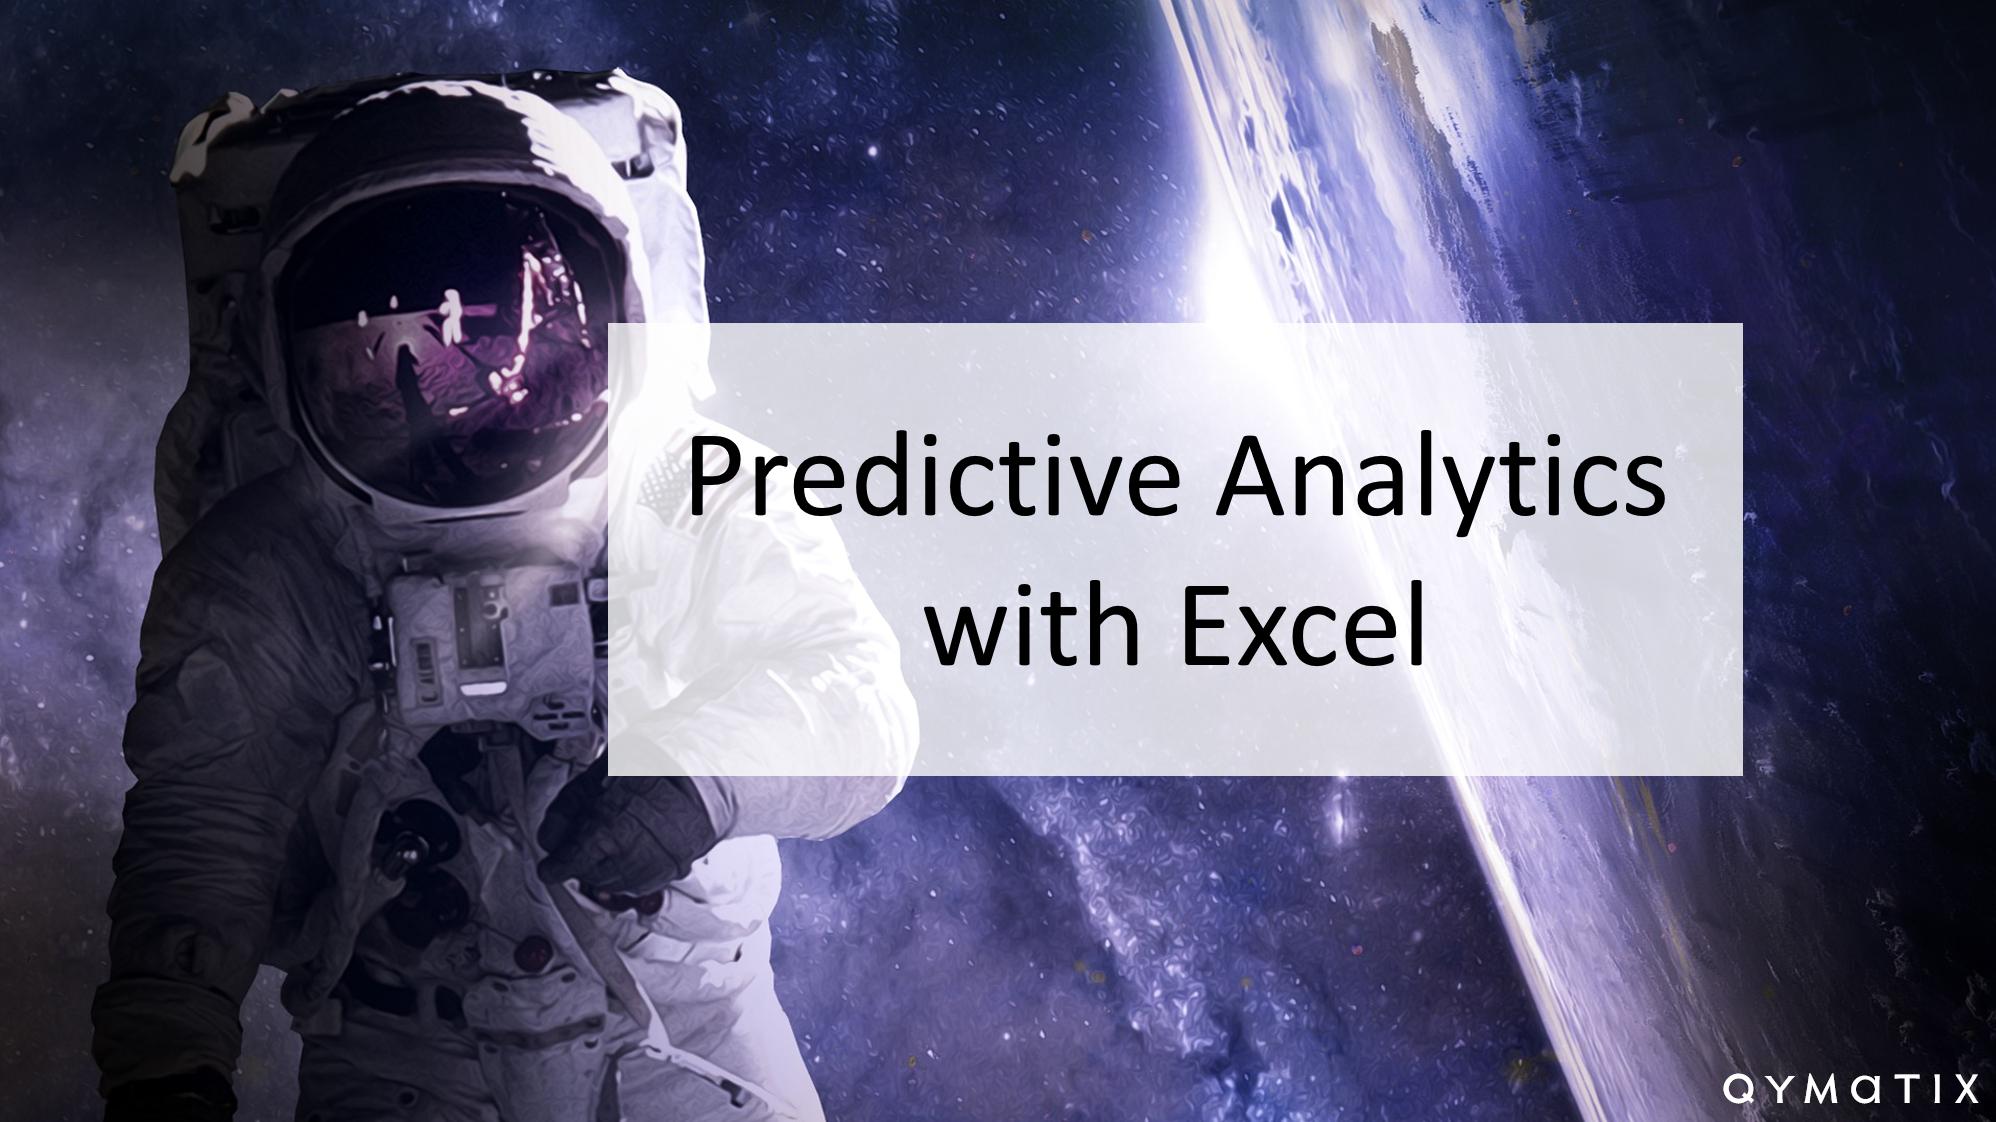 Predictive Analytics with Excel